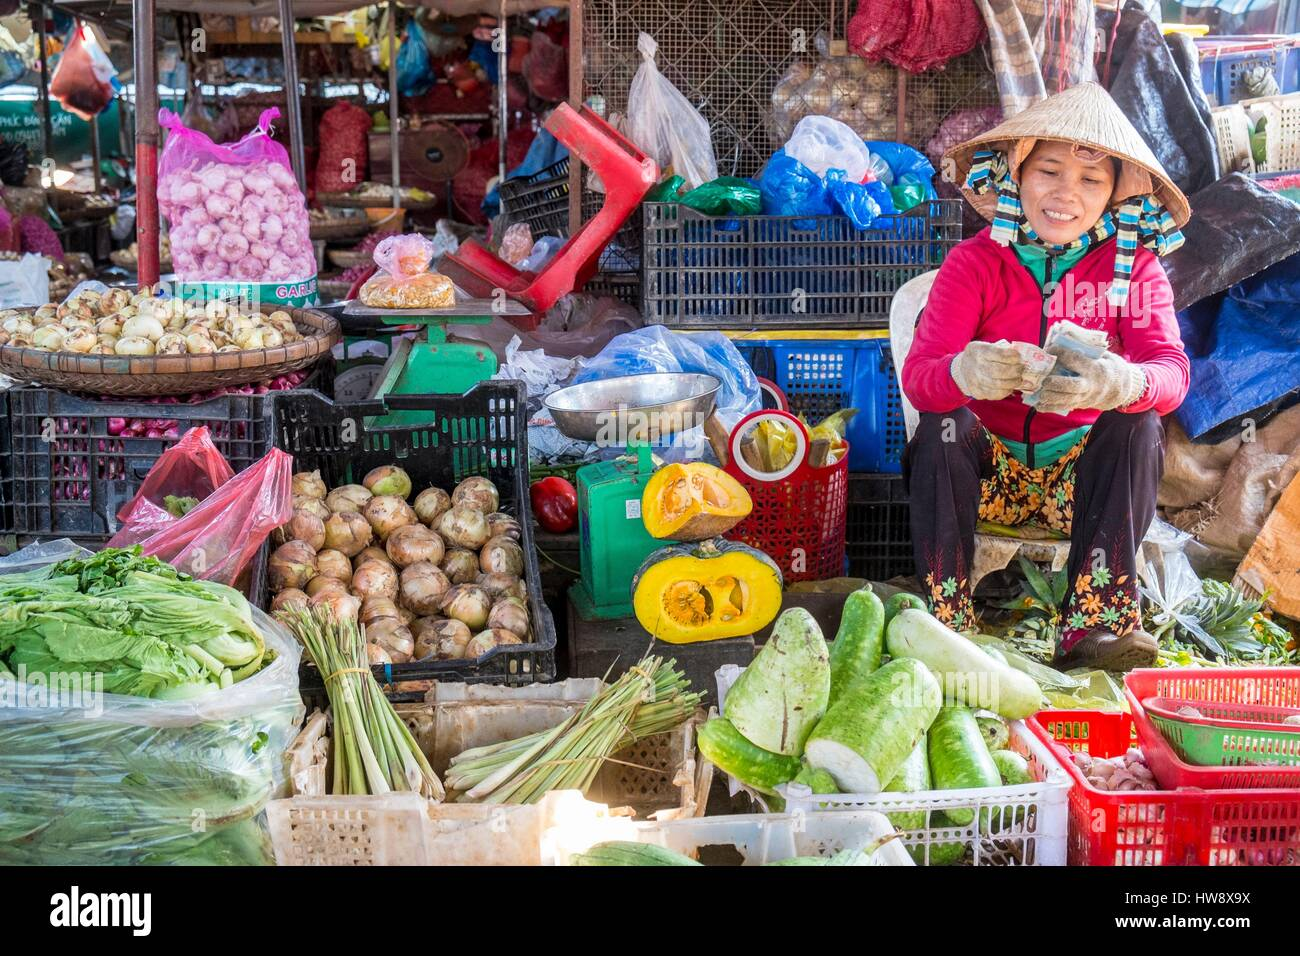 Vietnam, Khanh Hoa province, Nha Trang City, the market - Stock Image